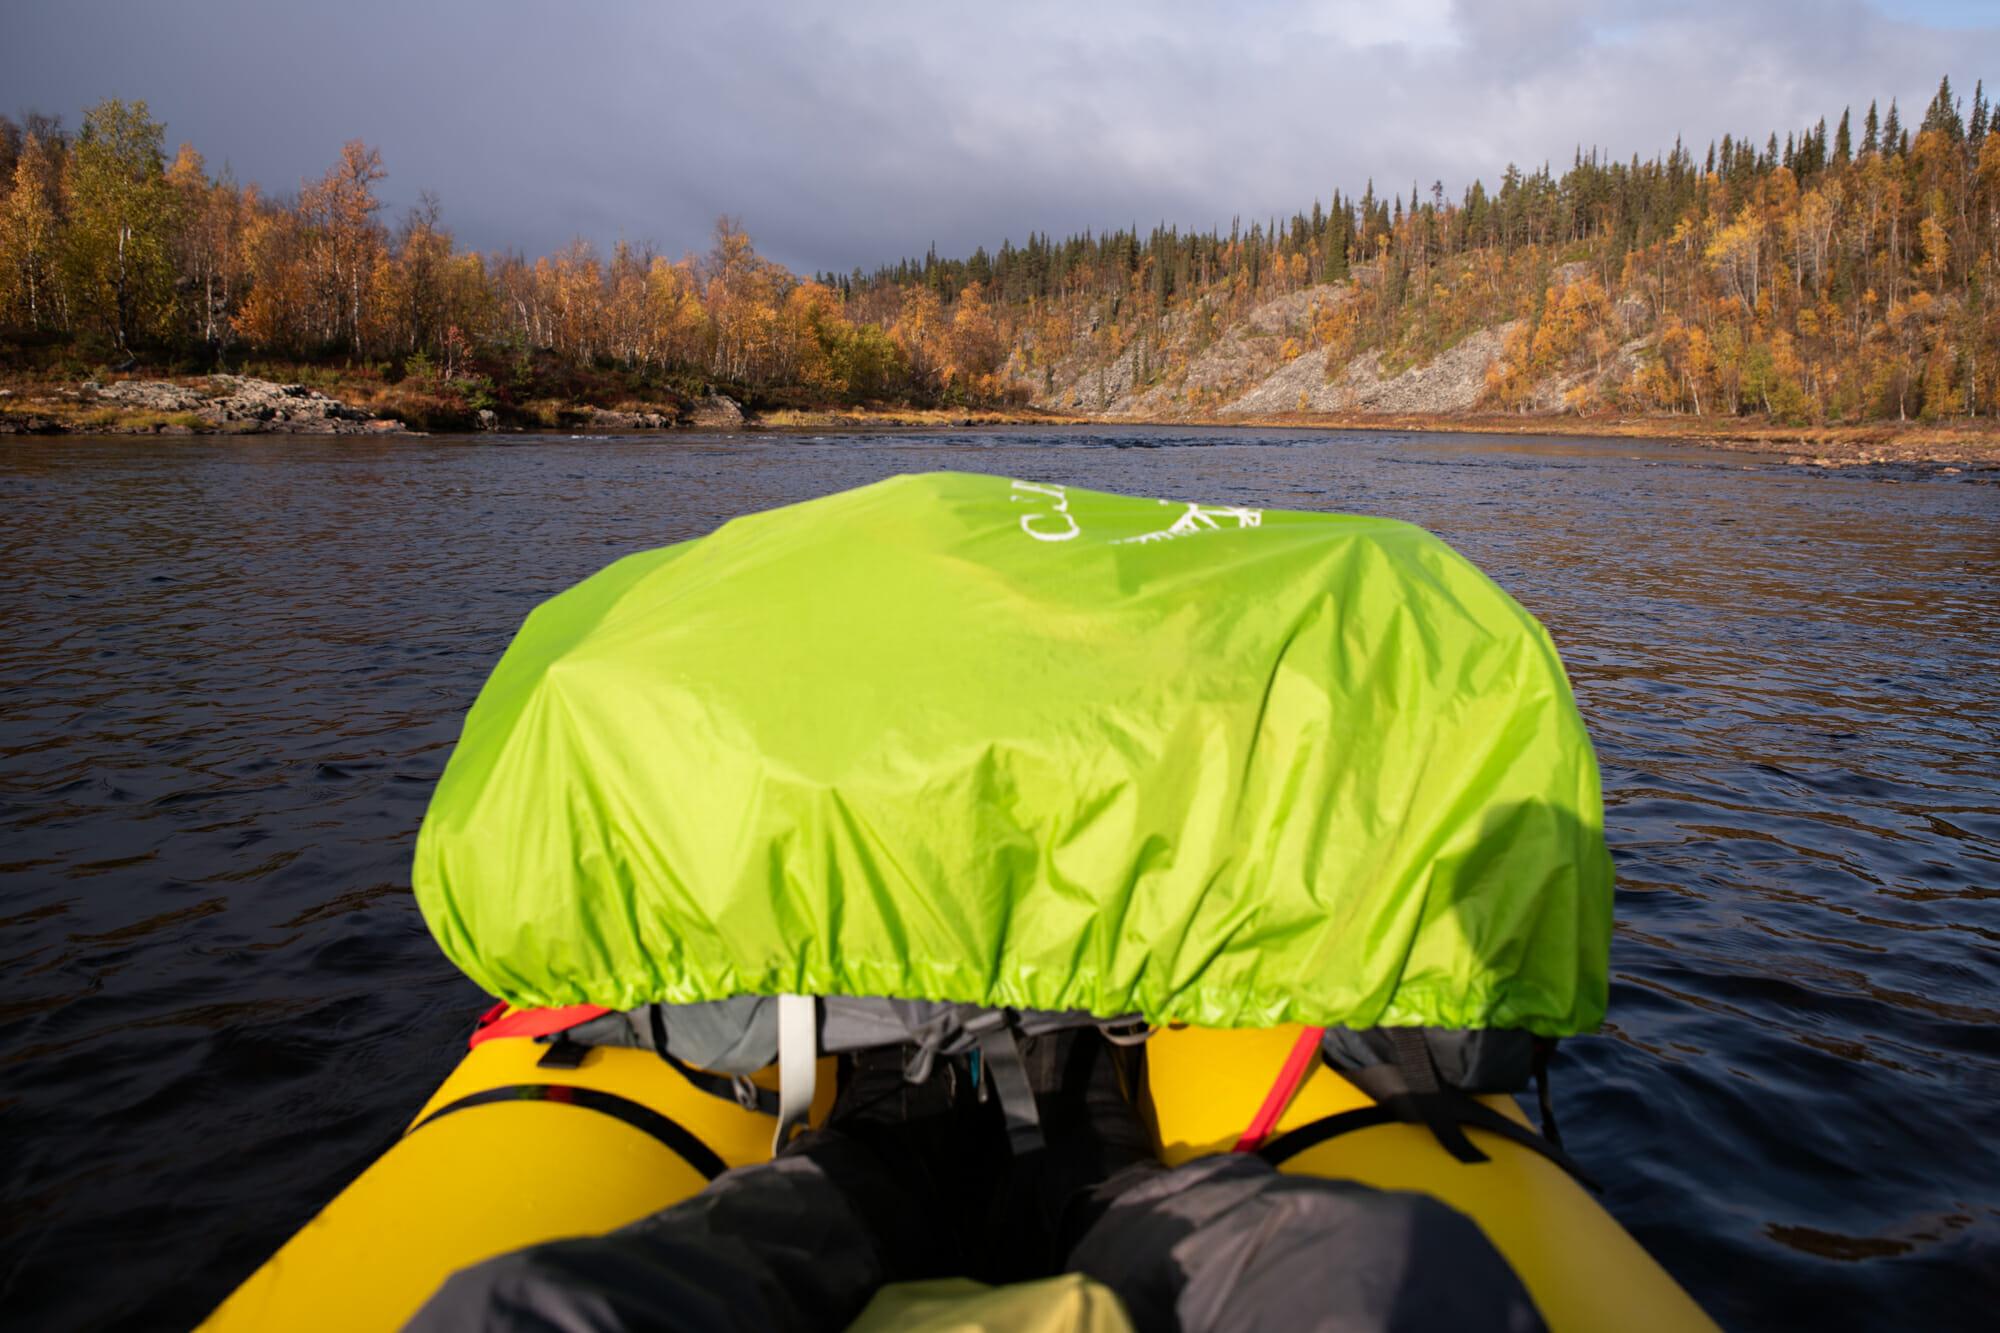 Sac Osprey sur packraft Kokopelli, Ivalojoki en packraft